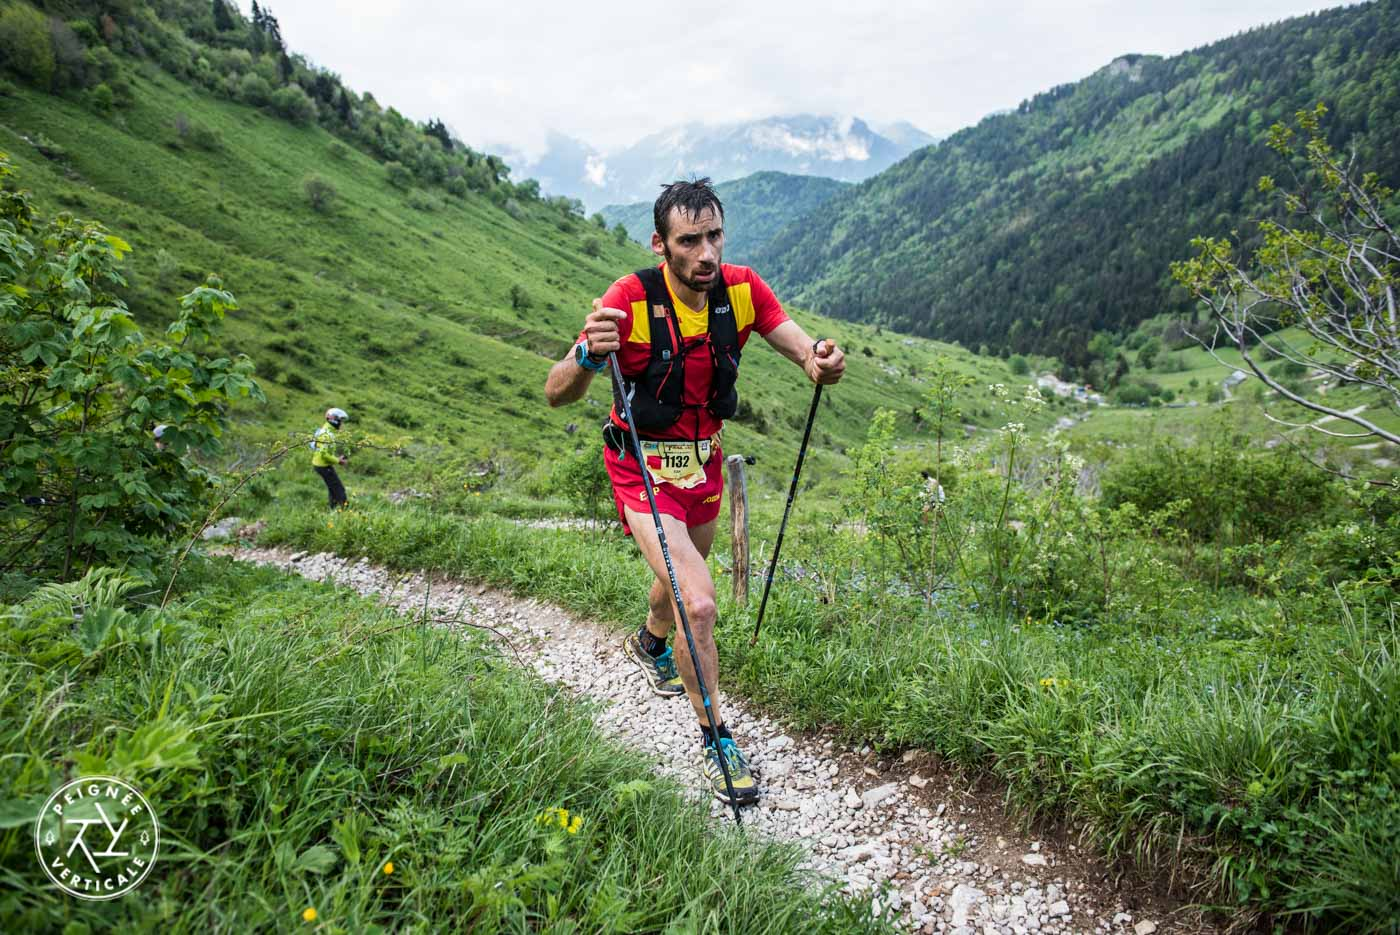 Clients-Maxi-Race-2015-Timothee-Nalet-Photographe-6071.jpg